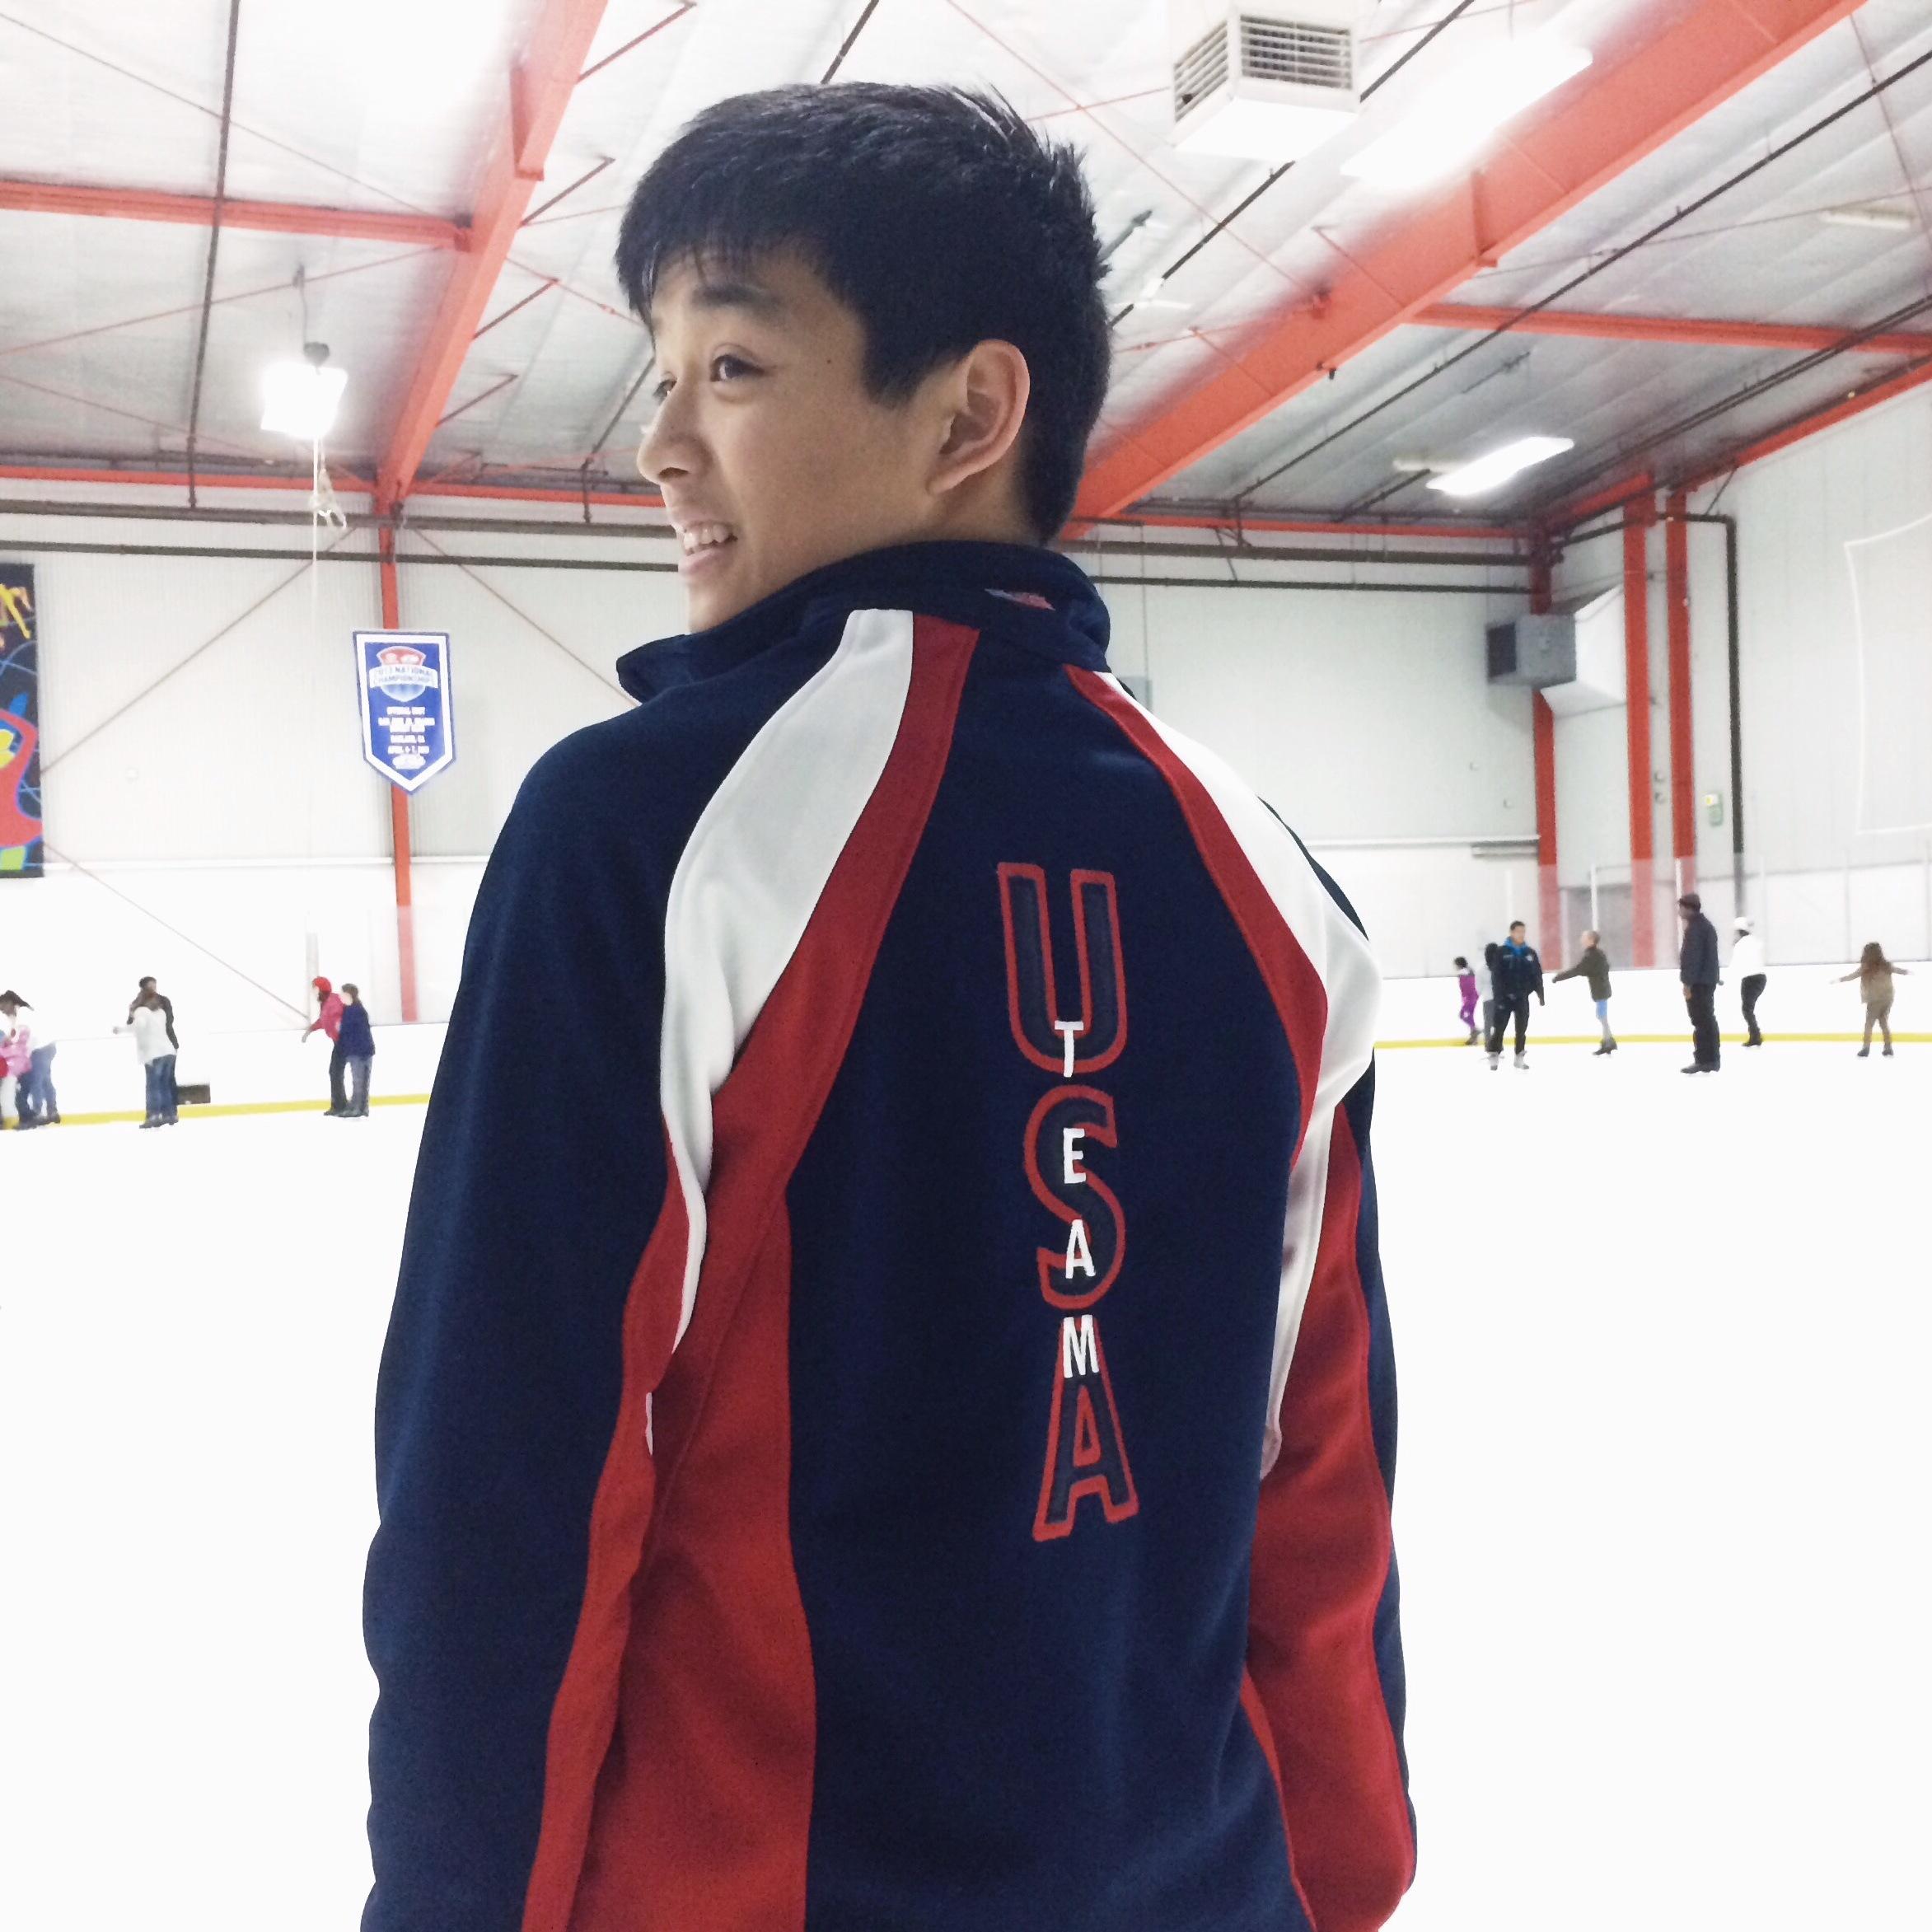 Sporting my new Team USA apparel